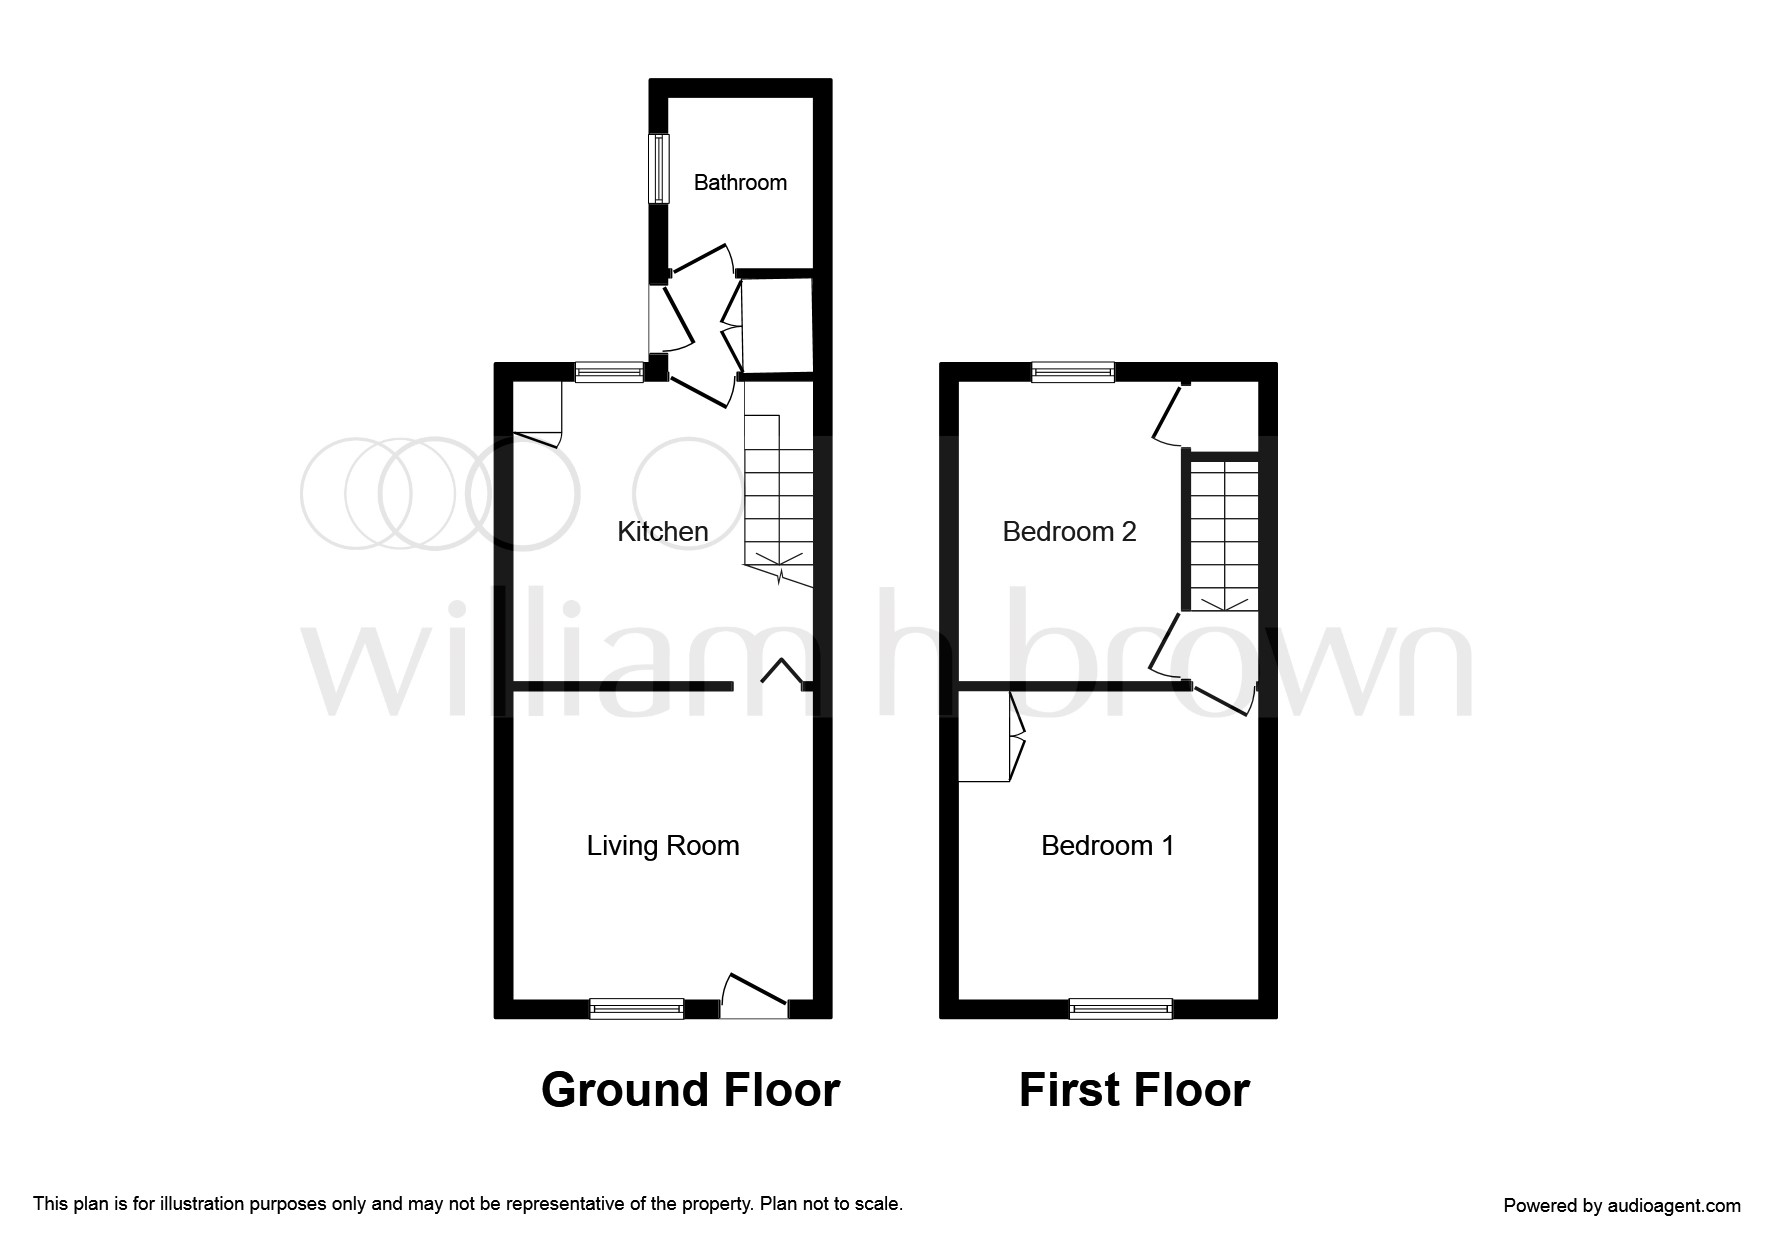 Kitchener street york yo31 2 bedroom terraced house for for 3 kitchener street leeds